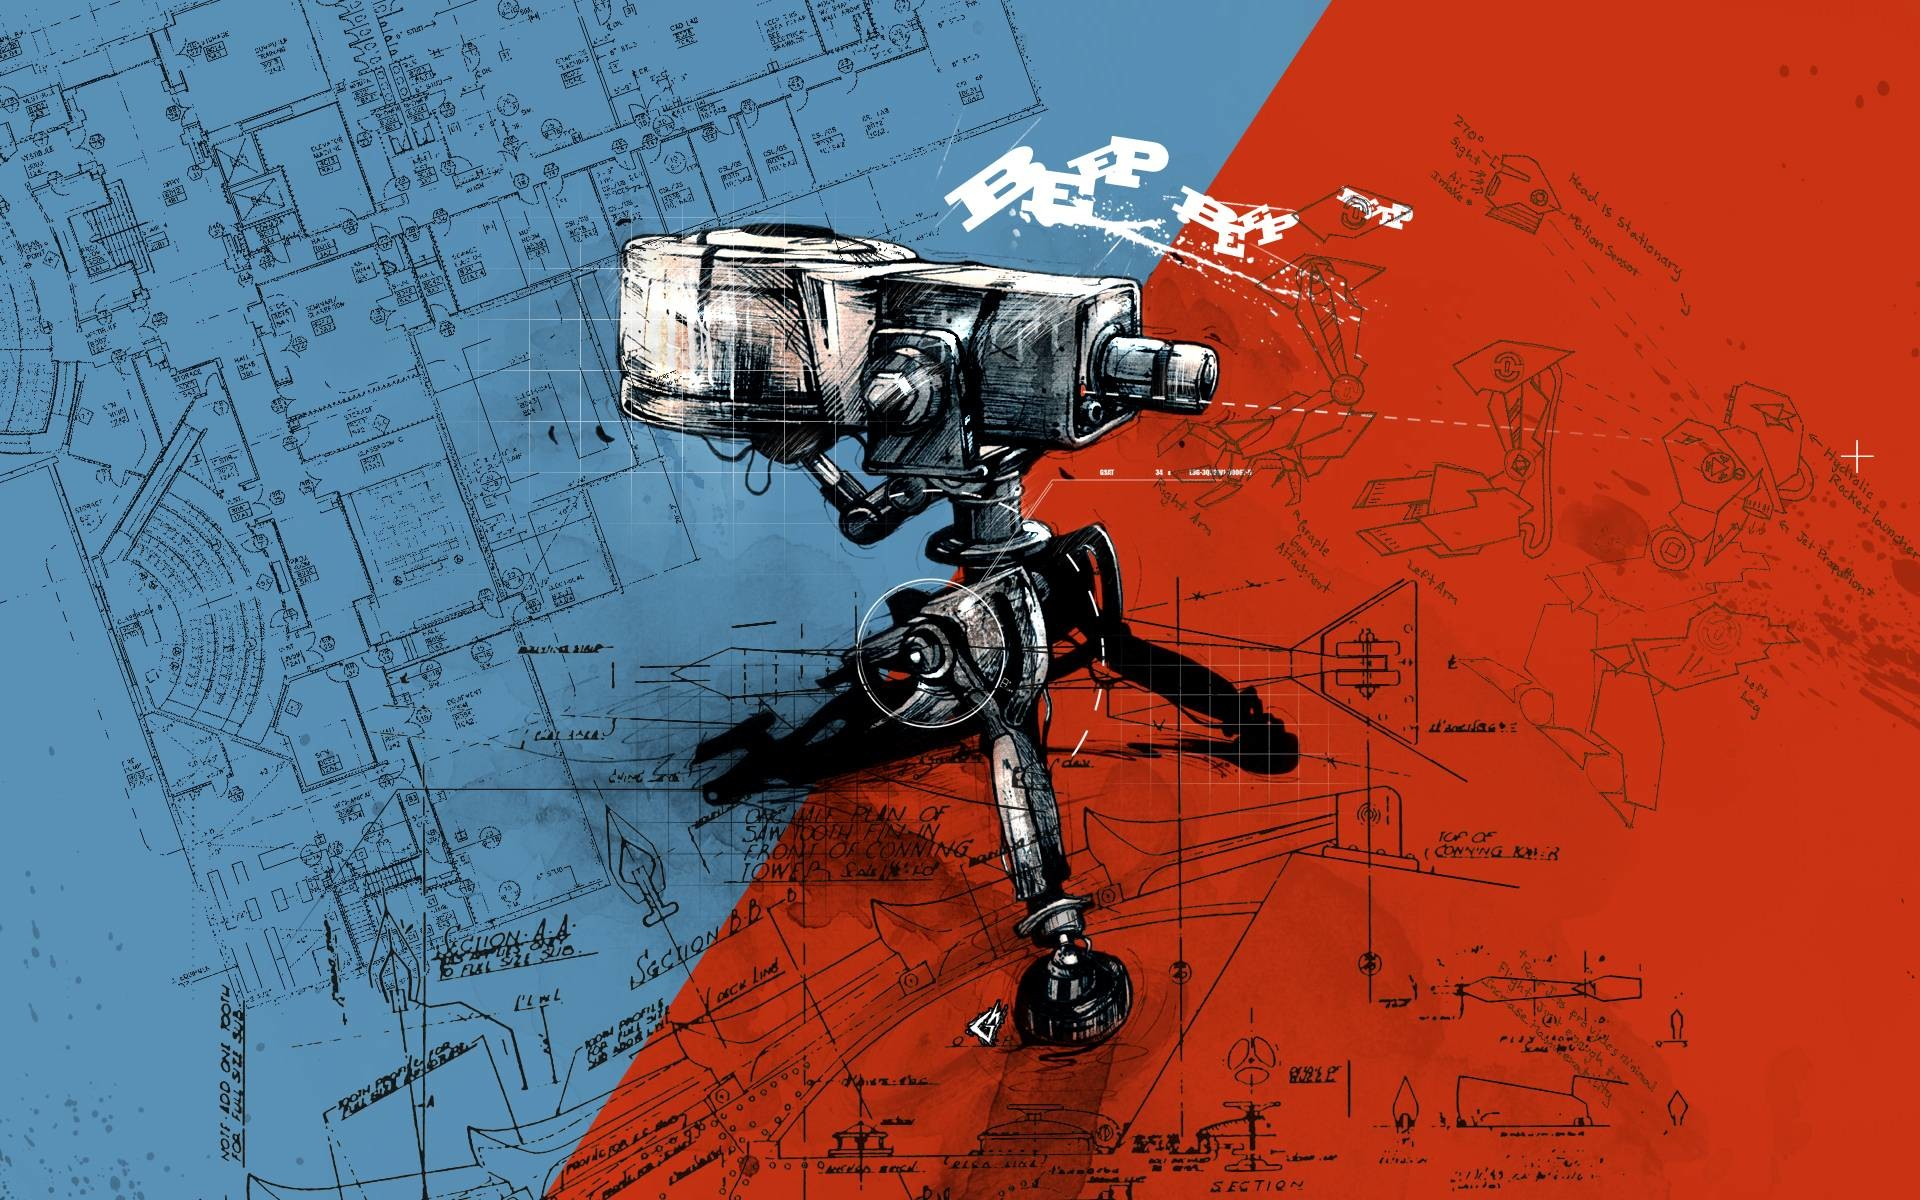 Mechanical <b>Engineering Wallpapers HD</b> – WallpaperSafari